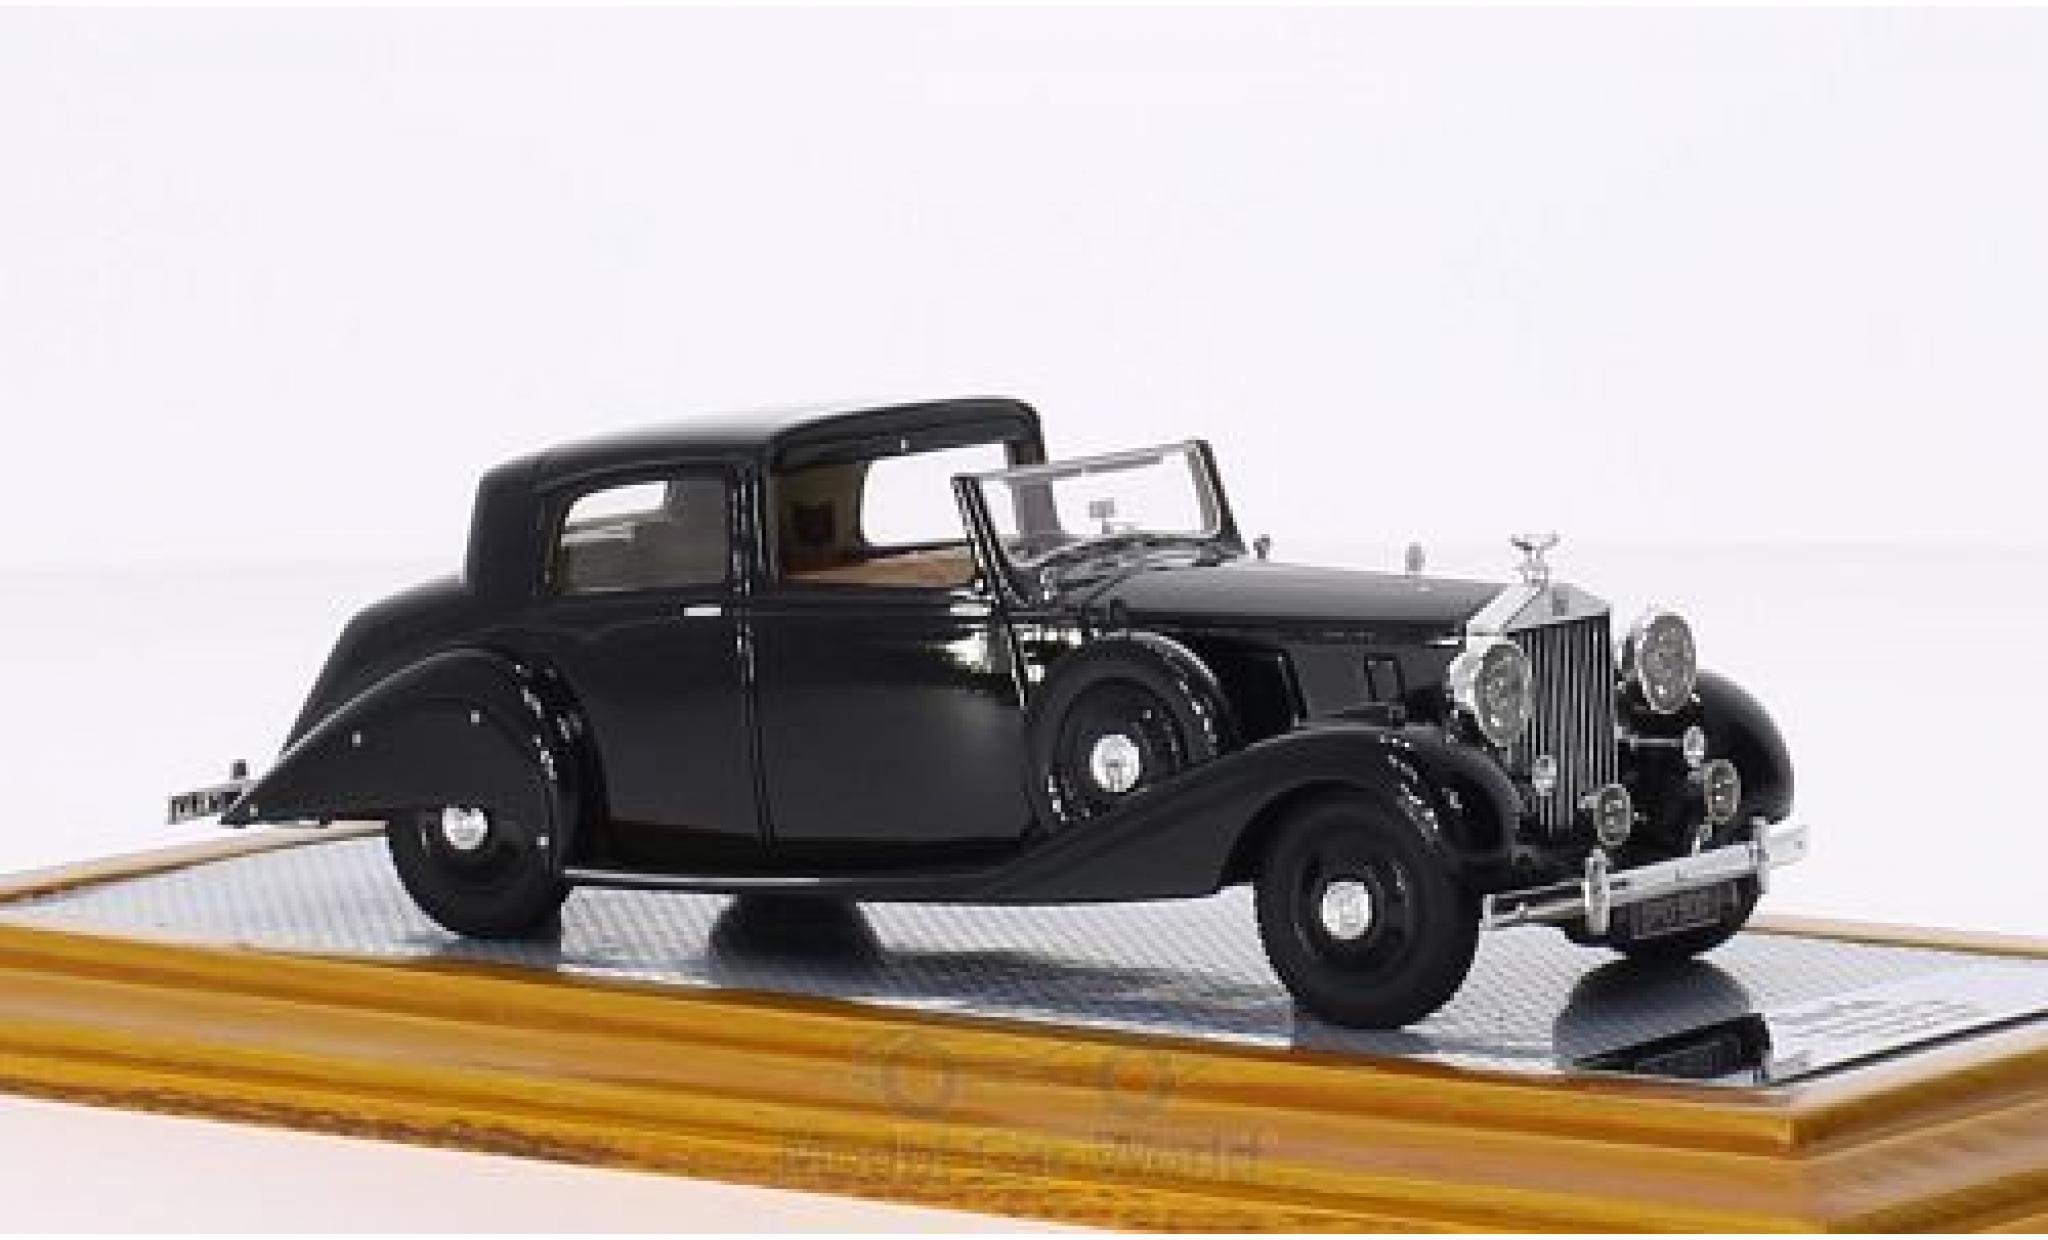 Rolls Royce Phantom 1/43 Ilario III Sedanca De Ville Hooper noire RHD 1937 sn 3CP130